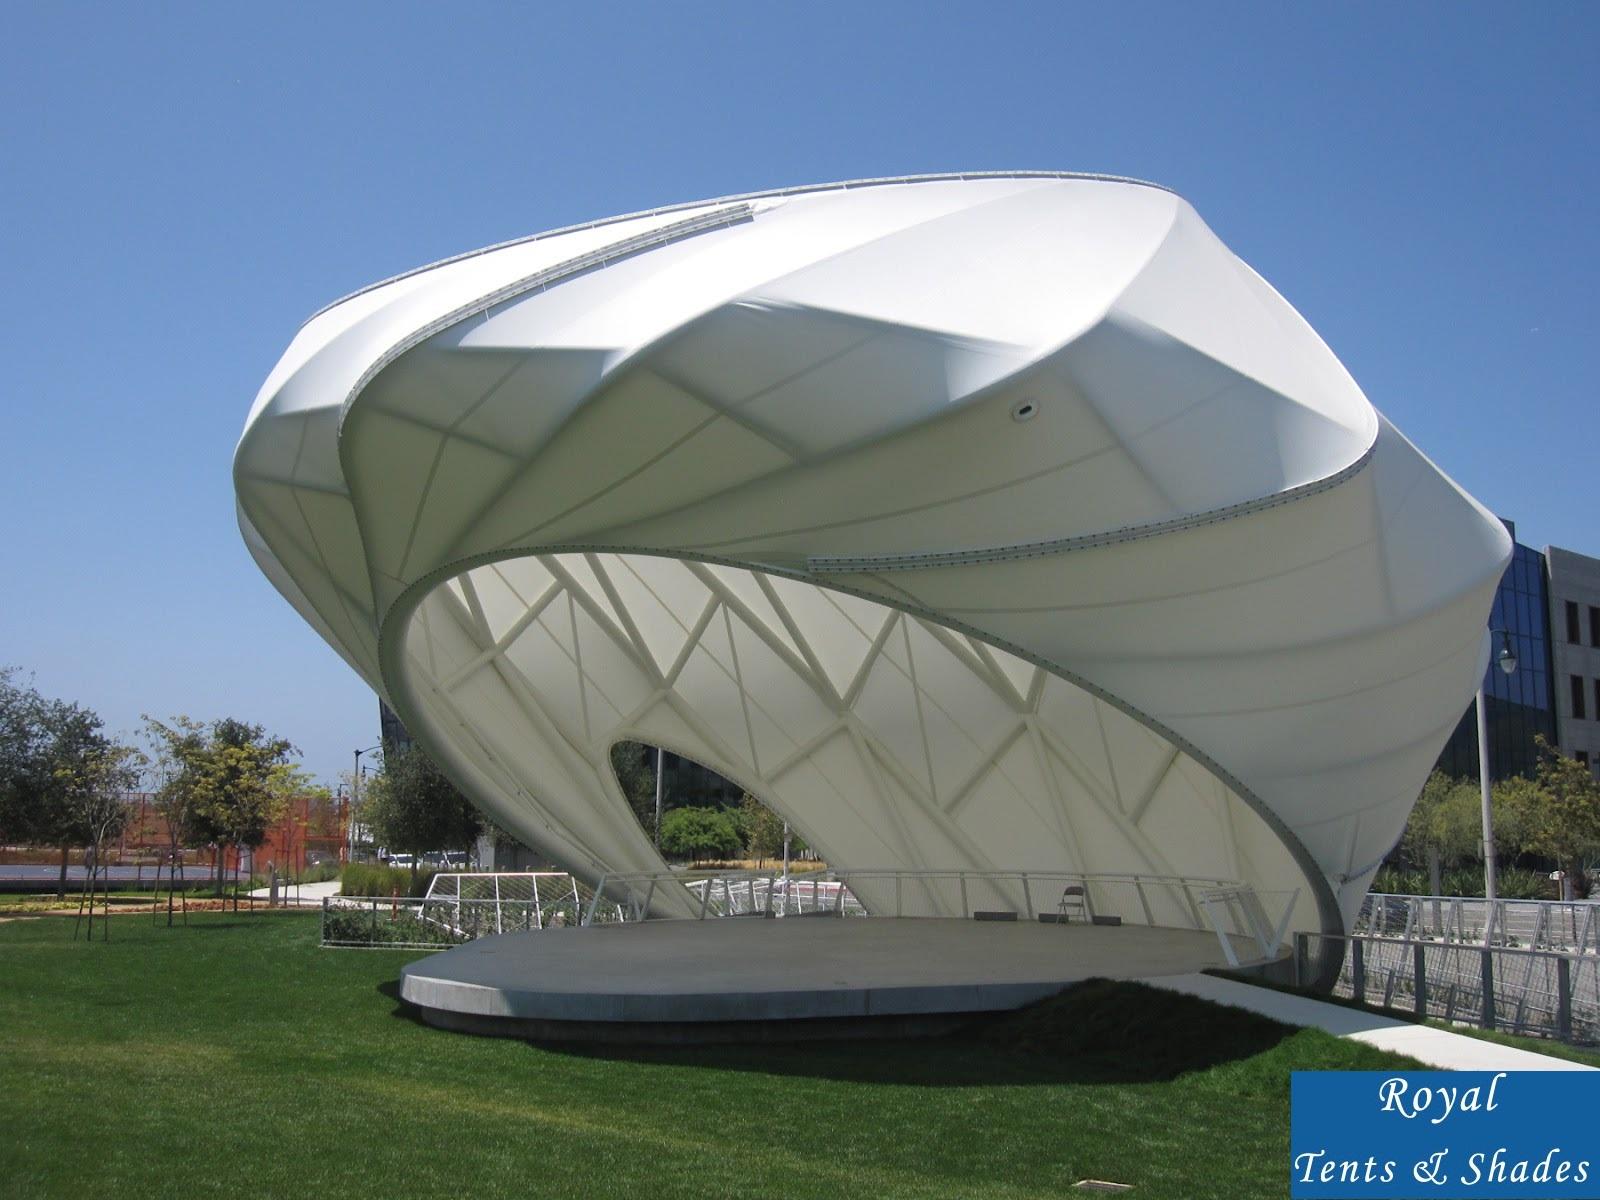 Entrance canopy manufacturers/suppliers in Dubai/Abu Dhabi/UAE